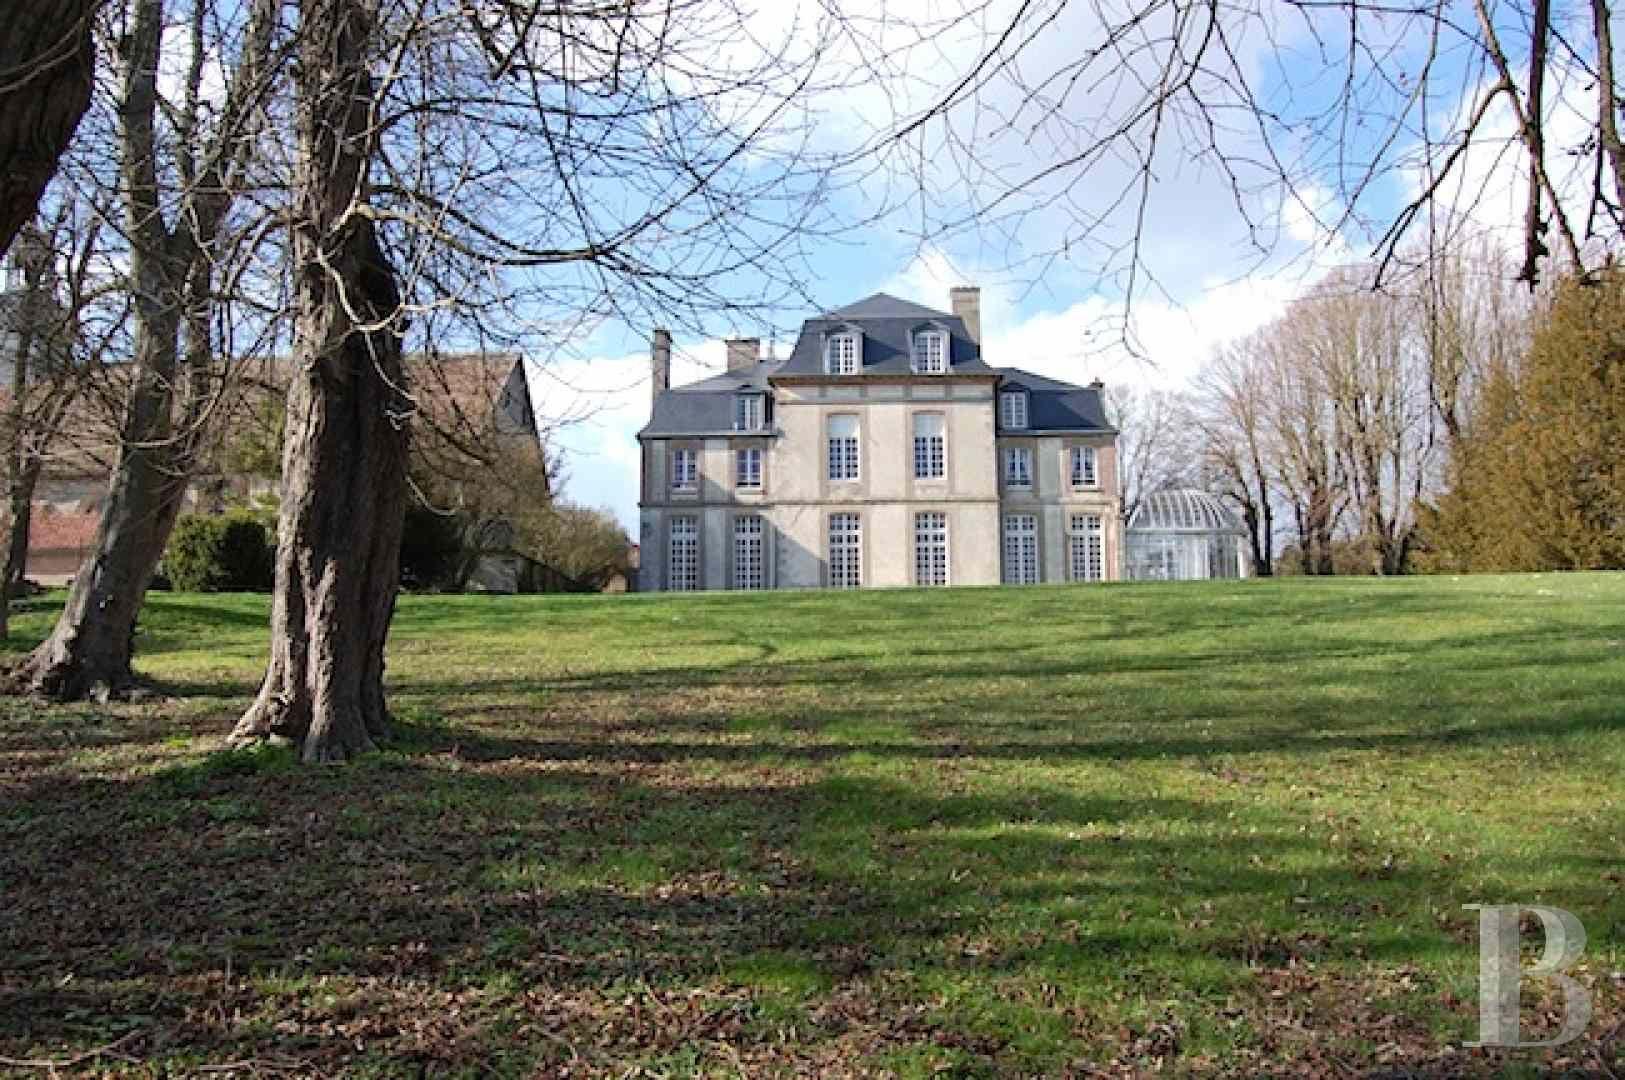 16th Century French Home - dcd6ce467671d3943d2c7647d2cb1d31_Simple 16th Century French Home - dcd6ce467671d3943d2c7647d2cb1d31  Image_563989.jpg